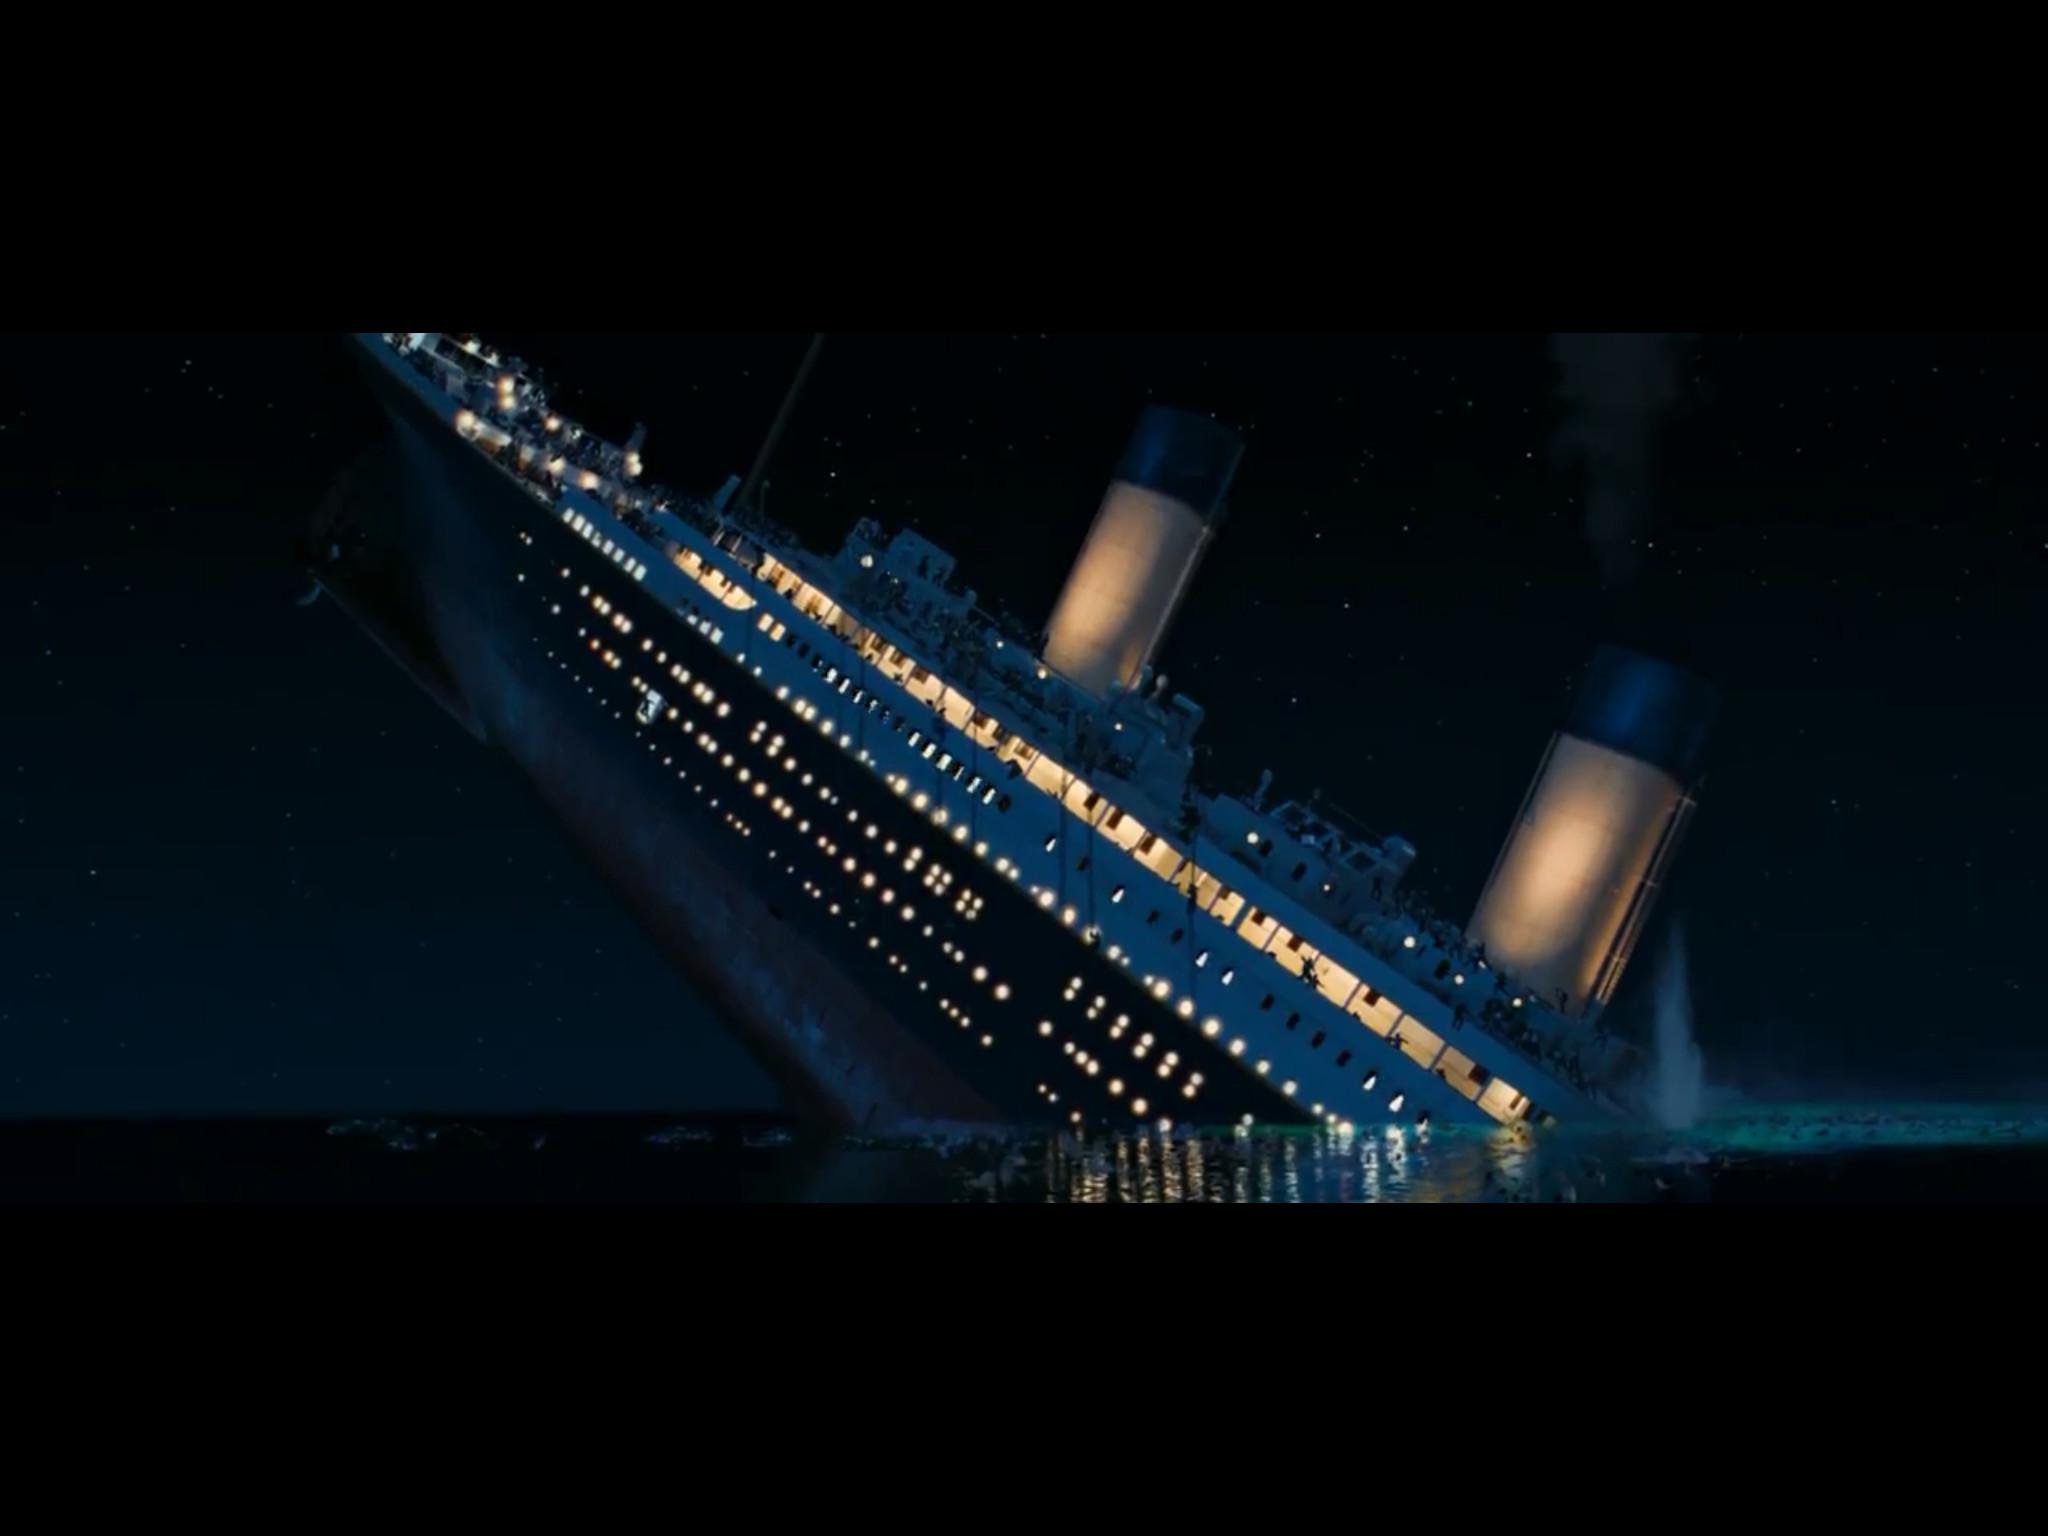 Titanic Sinking Wallpaper 183 '�